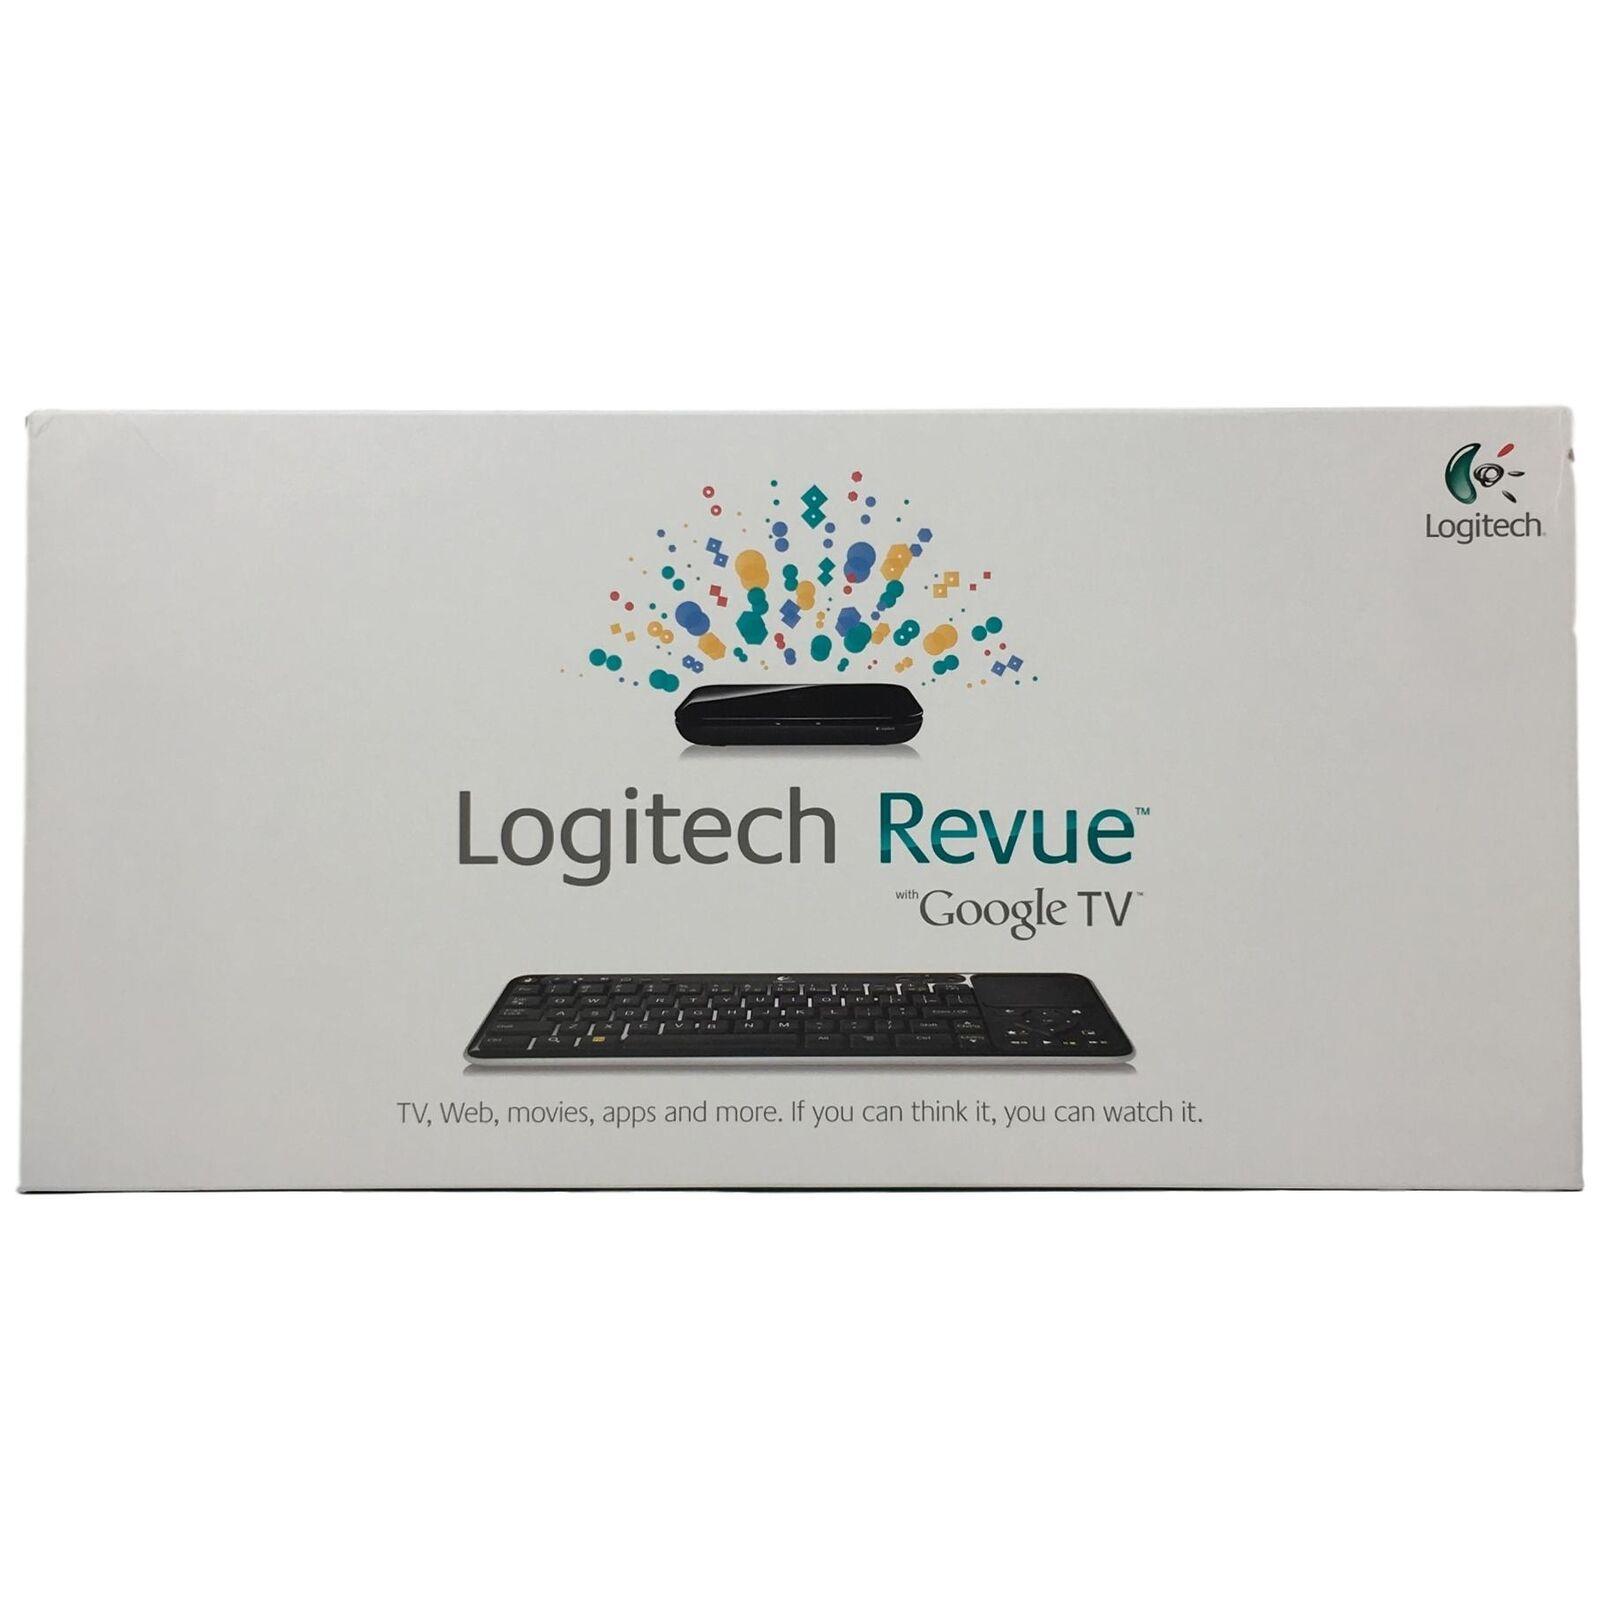 s-l1600 Logitech Revue Digital HD Google TV Media Player Streamer Keyboard Controller